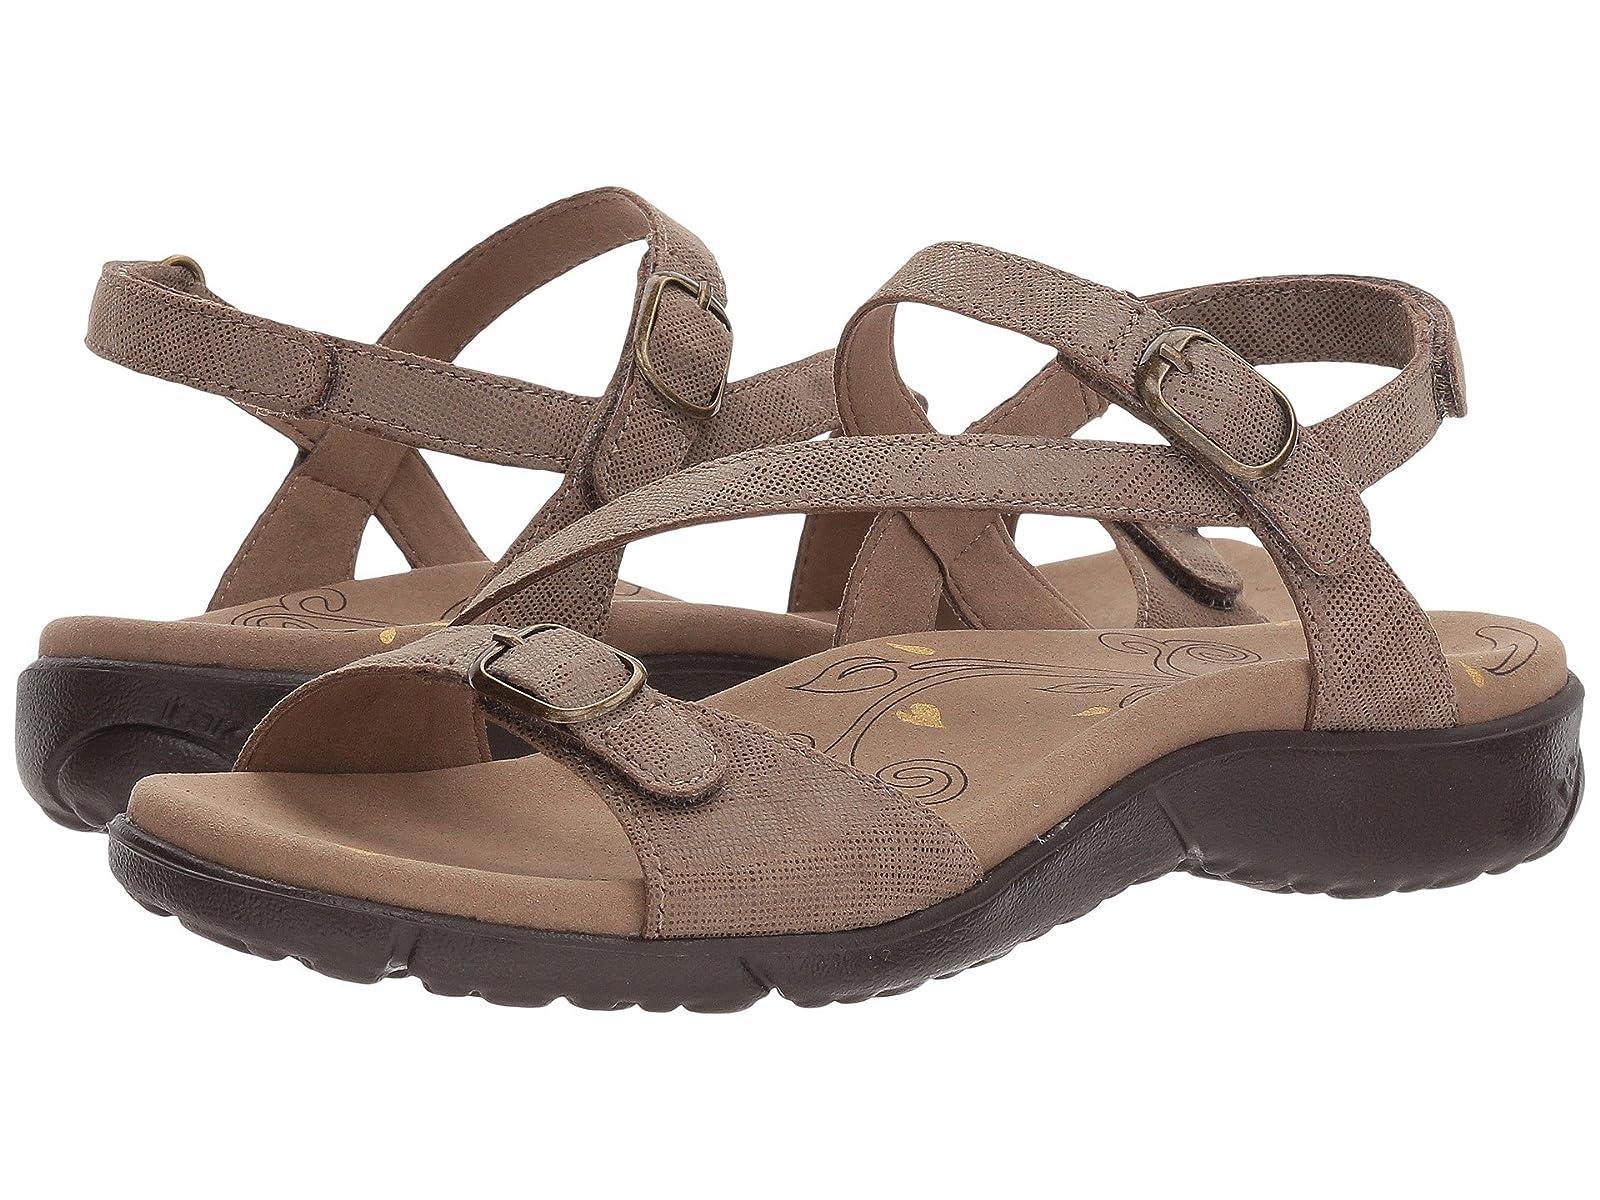 Taos Footwear BeautyAtmospheric grades have affordable shoes